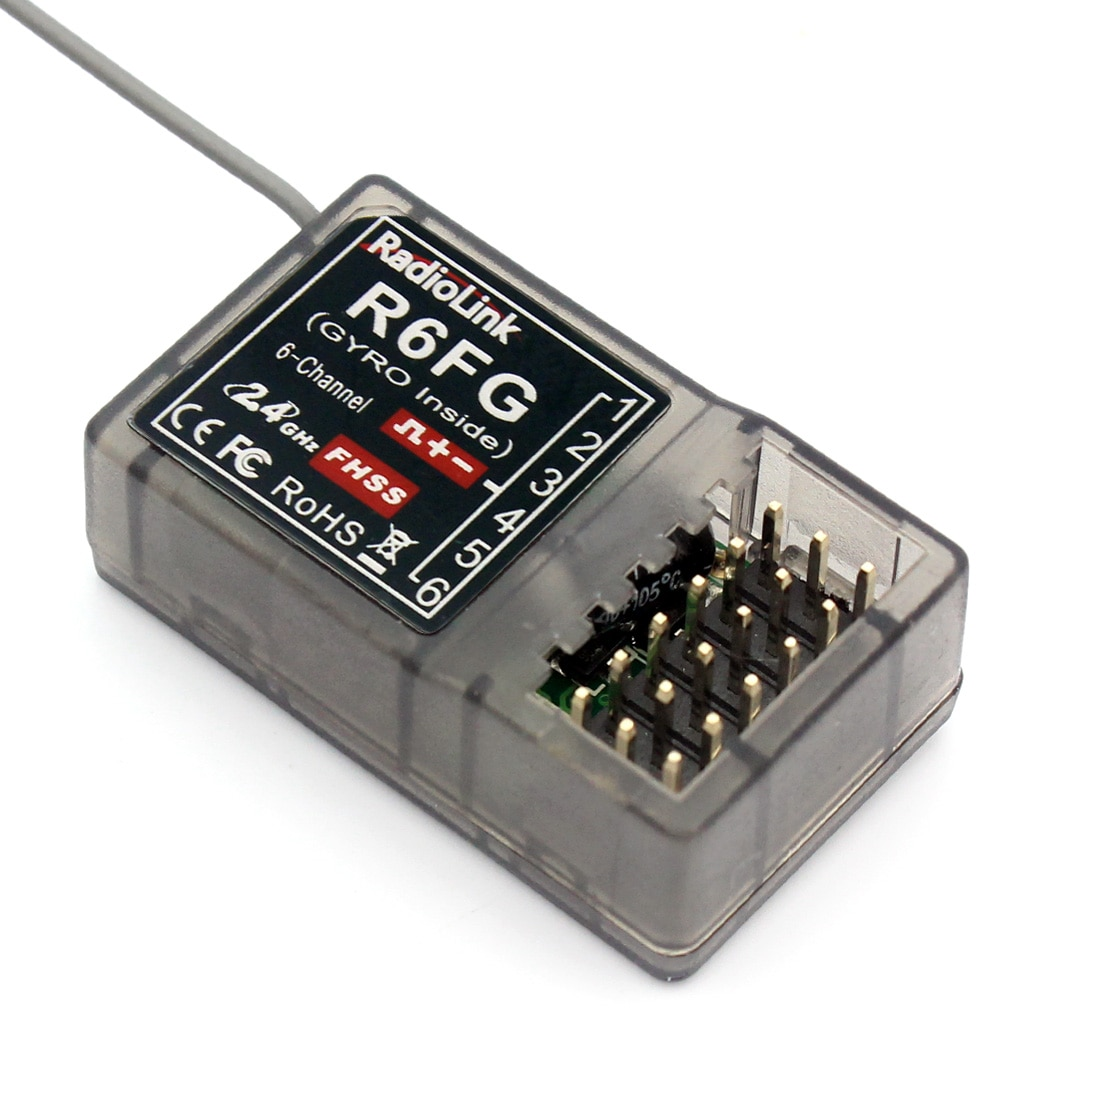 Radiolink R6FG 2,4 GHz 6 canales receptor FHSS sistema de Control de Radio Gyro Integrant para RC4GS RC3S, RC4G T8FB transmisor F21425